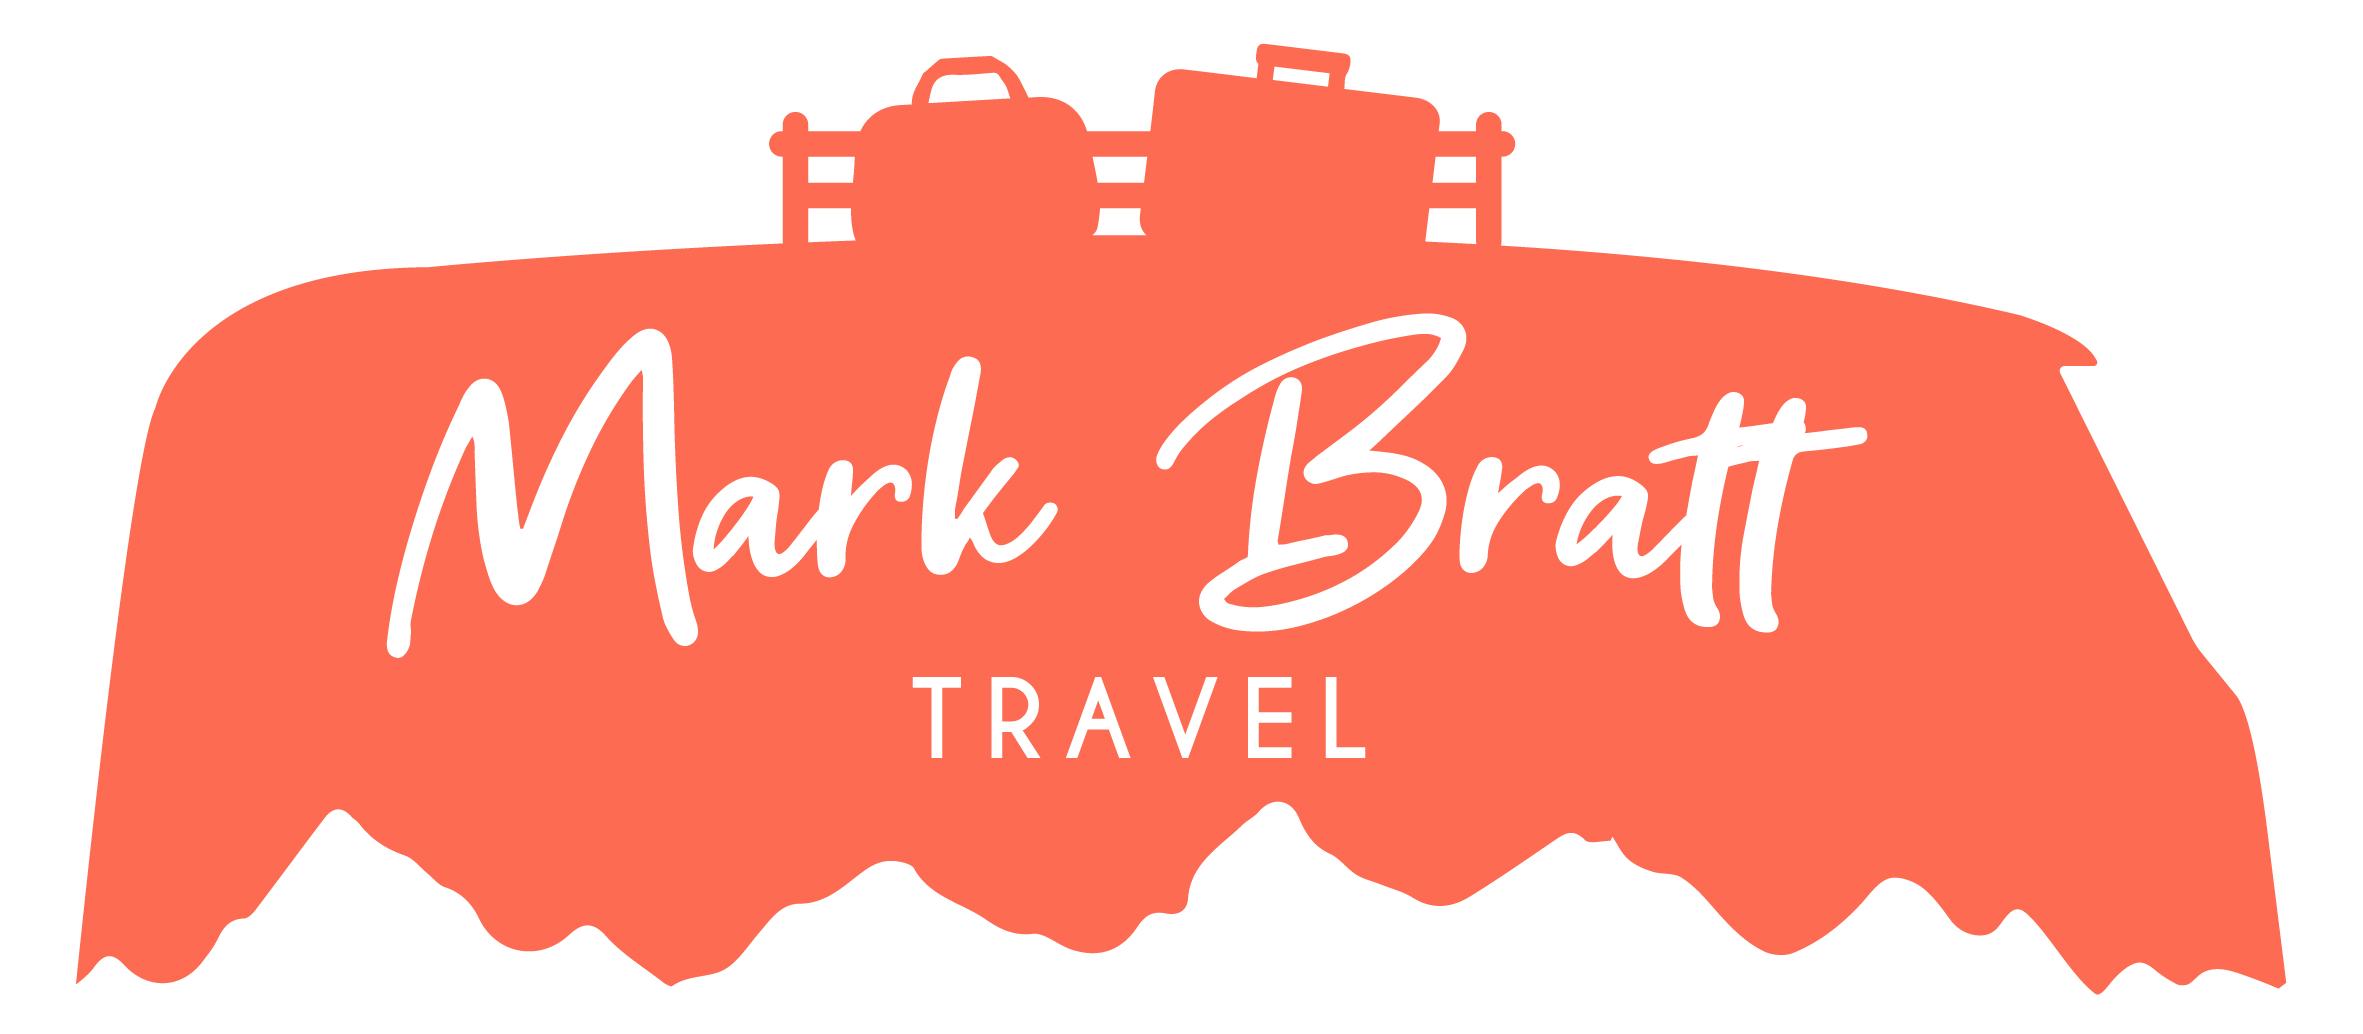 Mark Bratt Travel